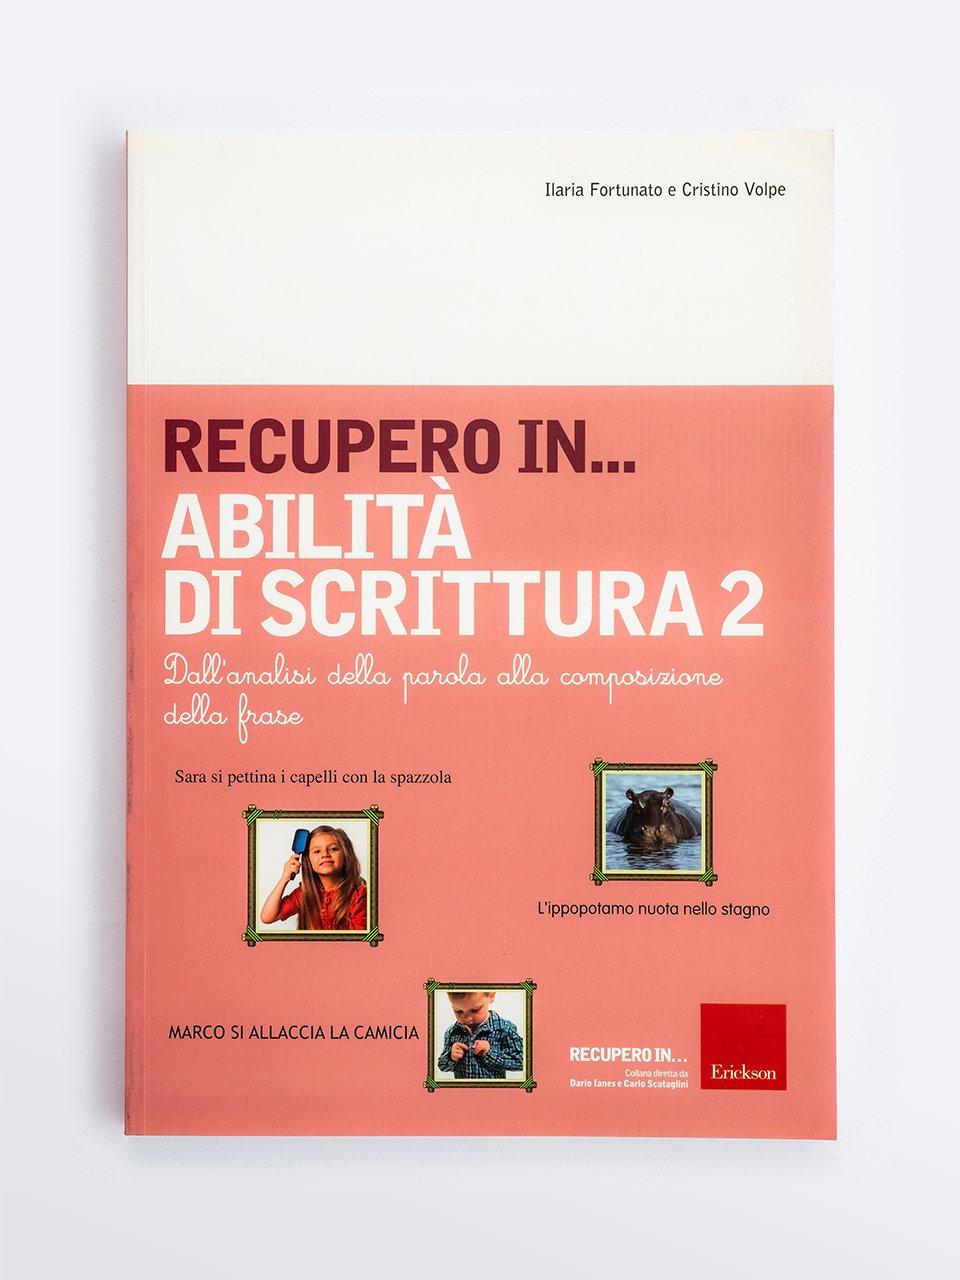 RECUPERO IN... Abilità di scrittura 2 - Abilità cognitive - Vol. 1: Percezione visiva - Libri - Erickson